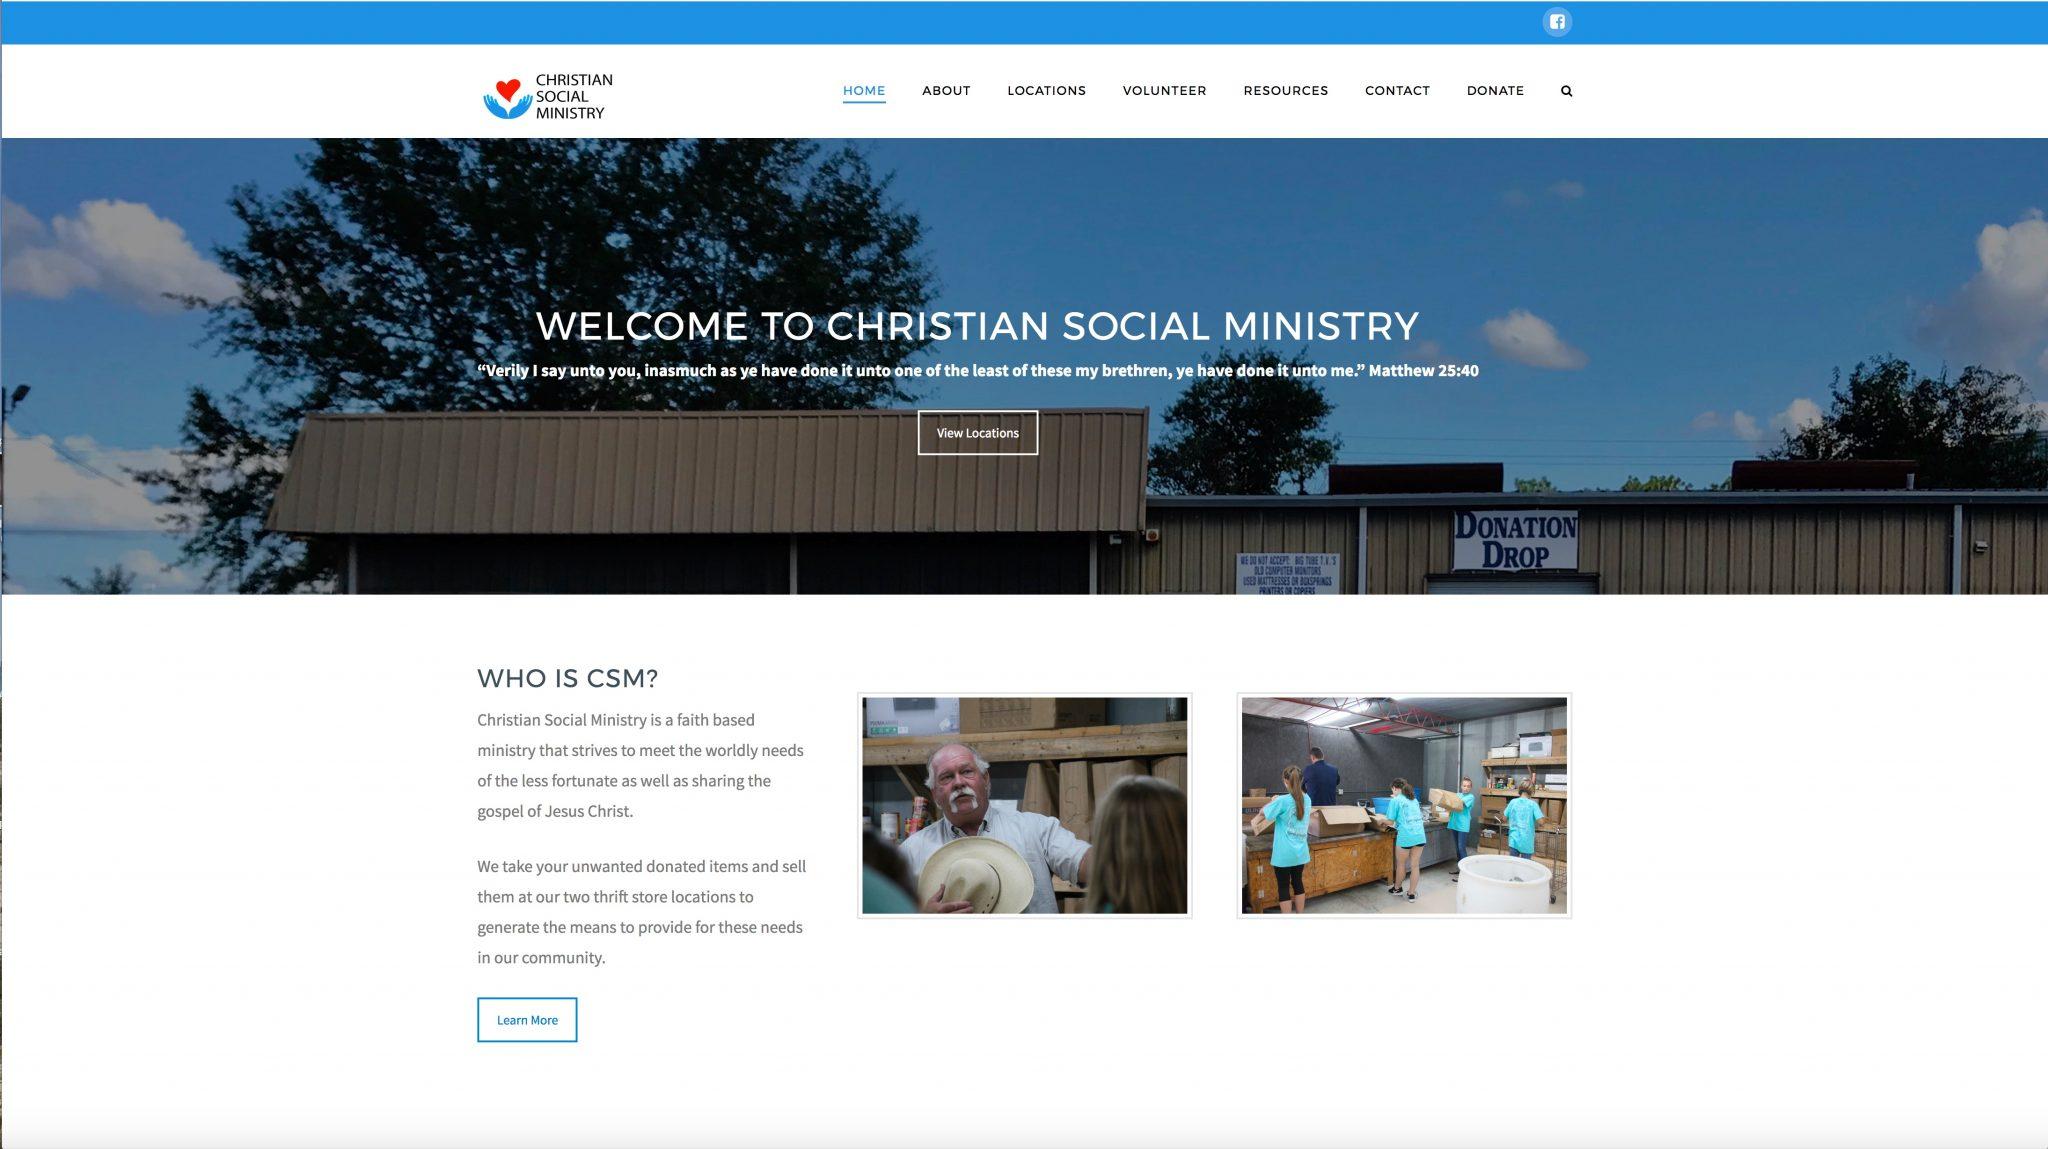 Christian Social Ministry